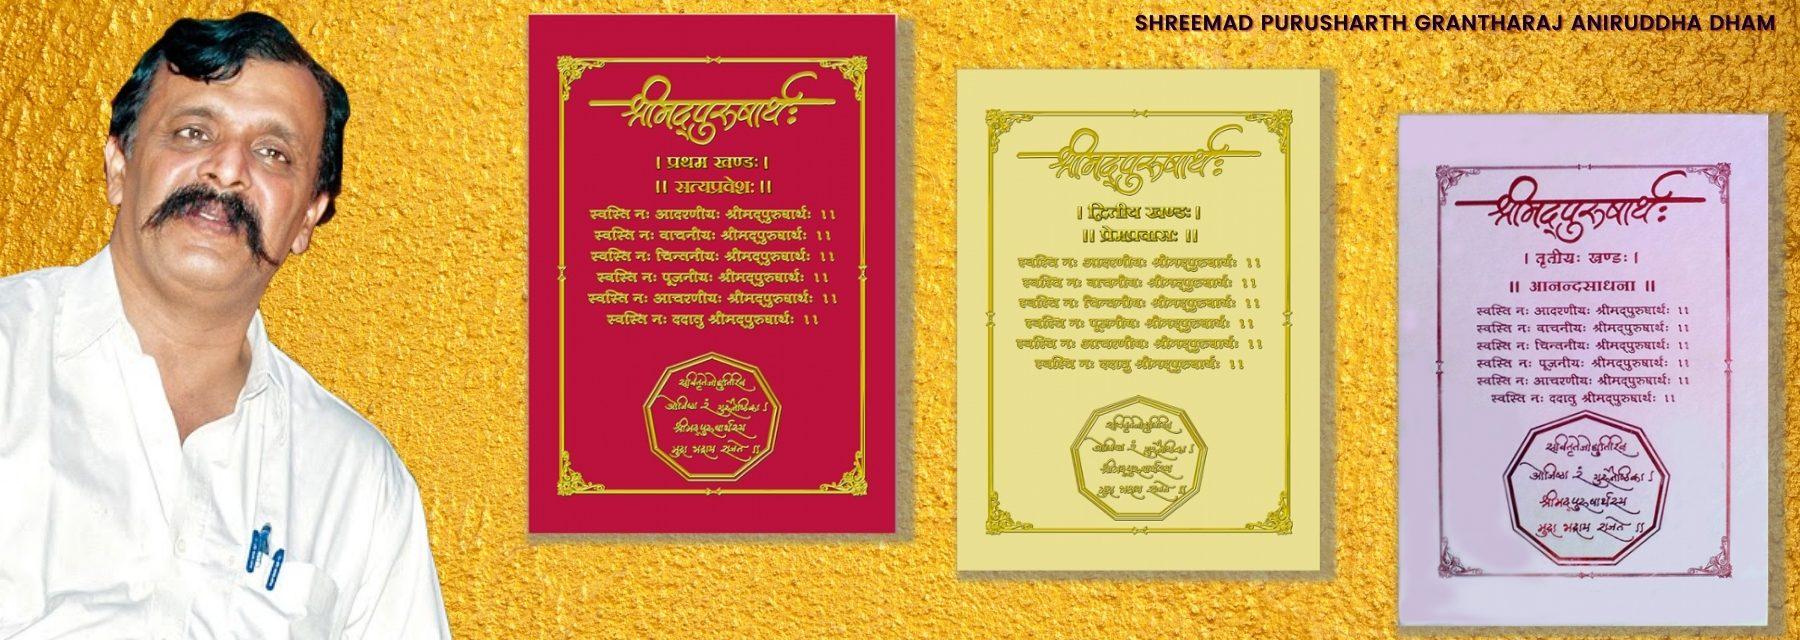 Shreemad Purusharth Granthraj Aniruddha Dham